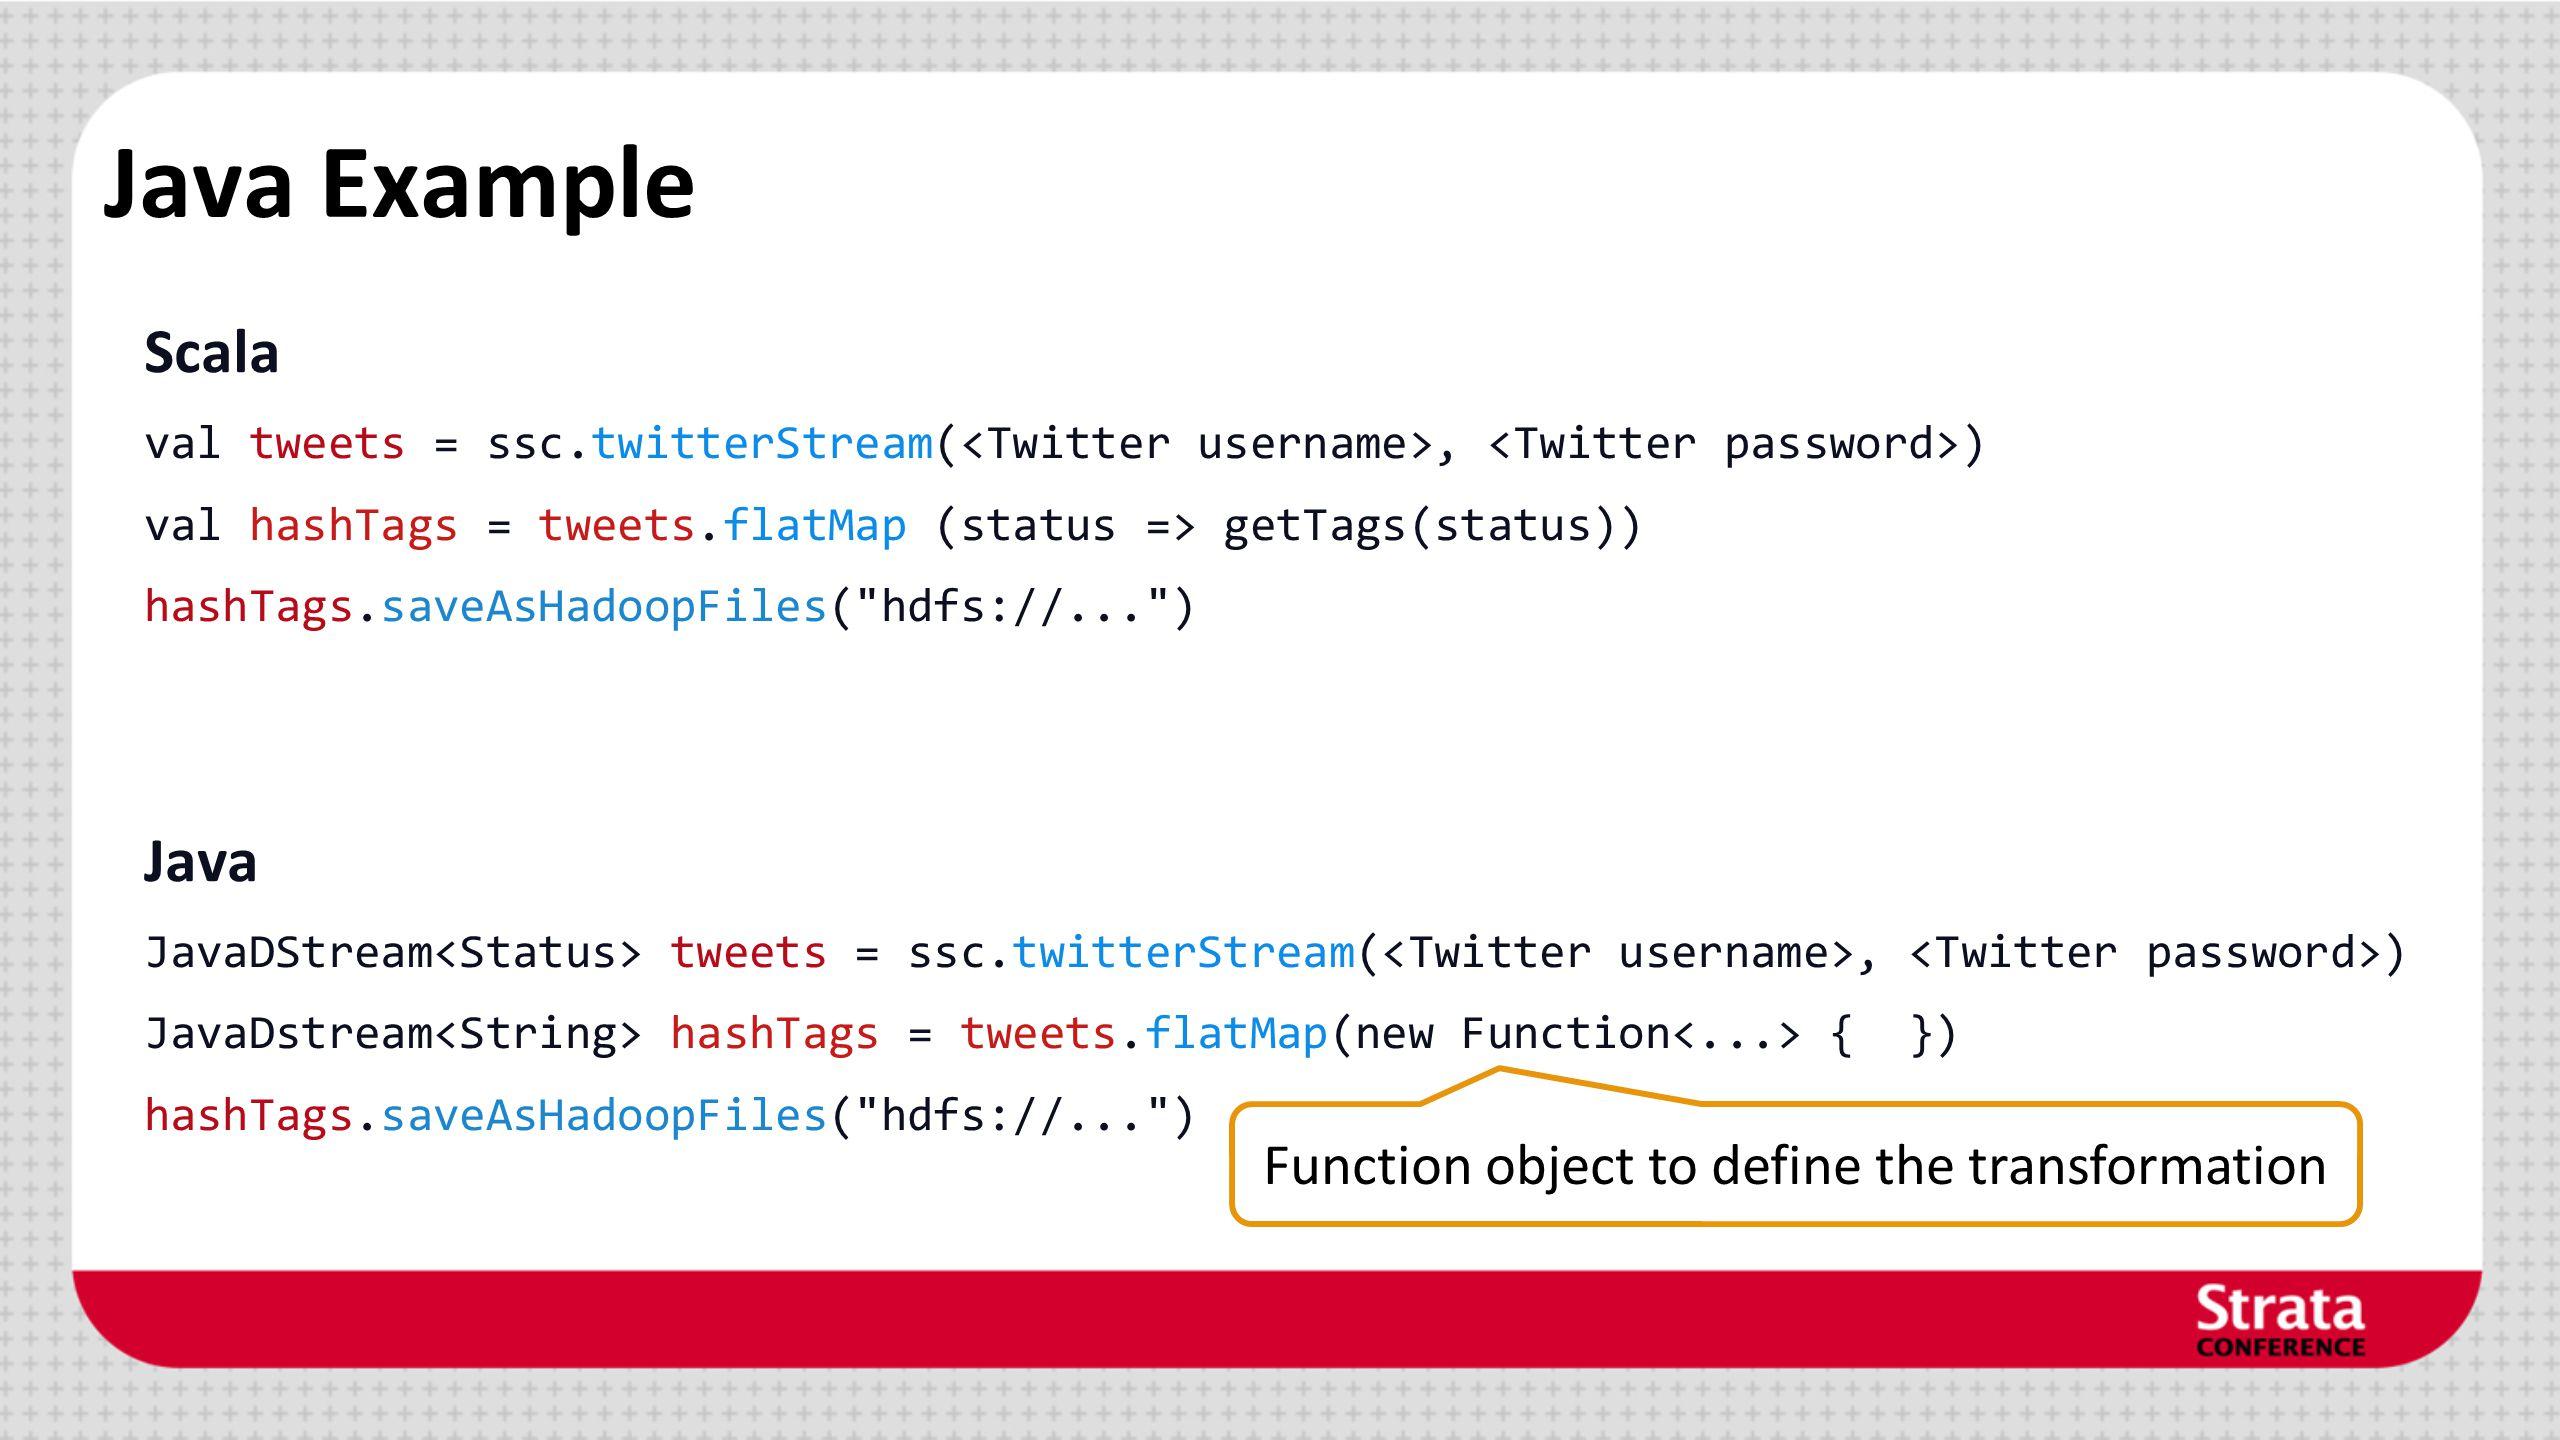 Java Example Scala val tweets = ssc.twitterStream(, ) val hashTags = tweets.flatMap (status => getTags(status)) hashTags.saveAsHadoopFiles( hdfs://... ) Java JavaDStream tweets = ssc.twitterStream(, ) JavaDstream hashTags = tweets.flatMap(new Function { }) hashTags.saveAsHadoopFiles( hdfs://... ) Function object to define the transformation